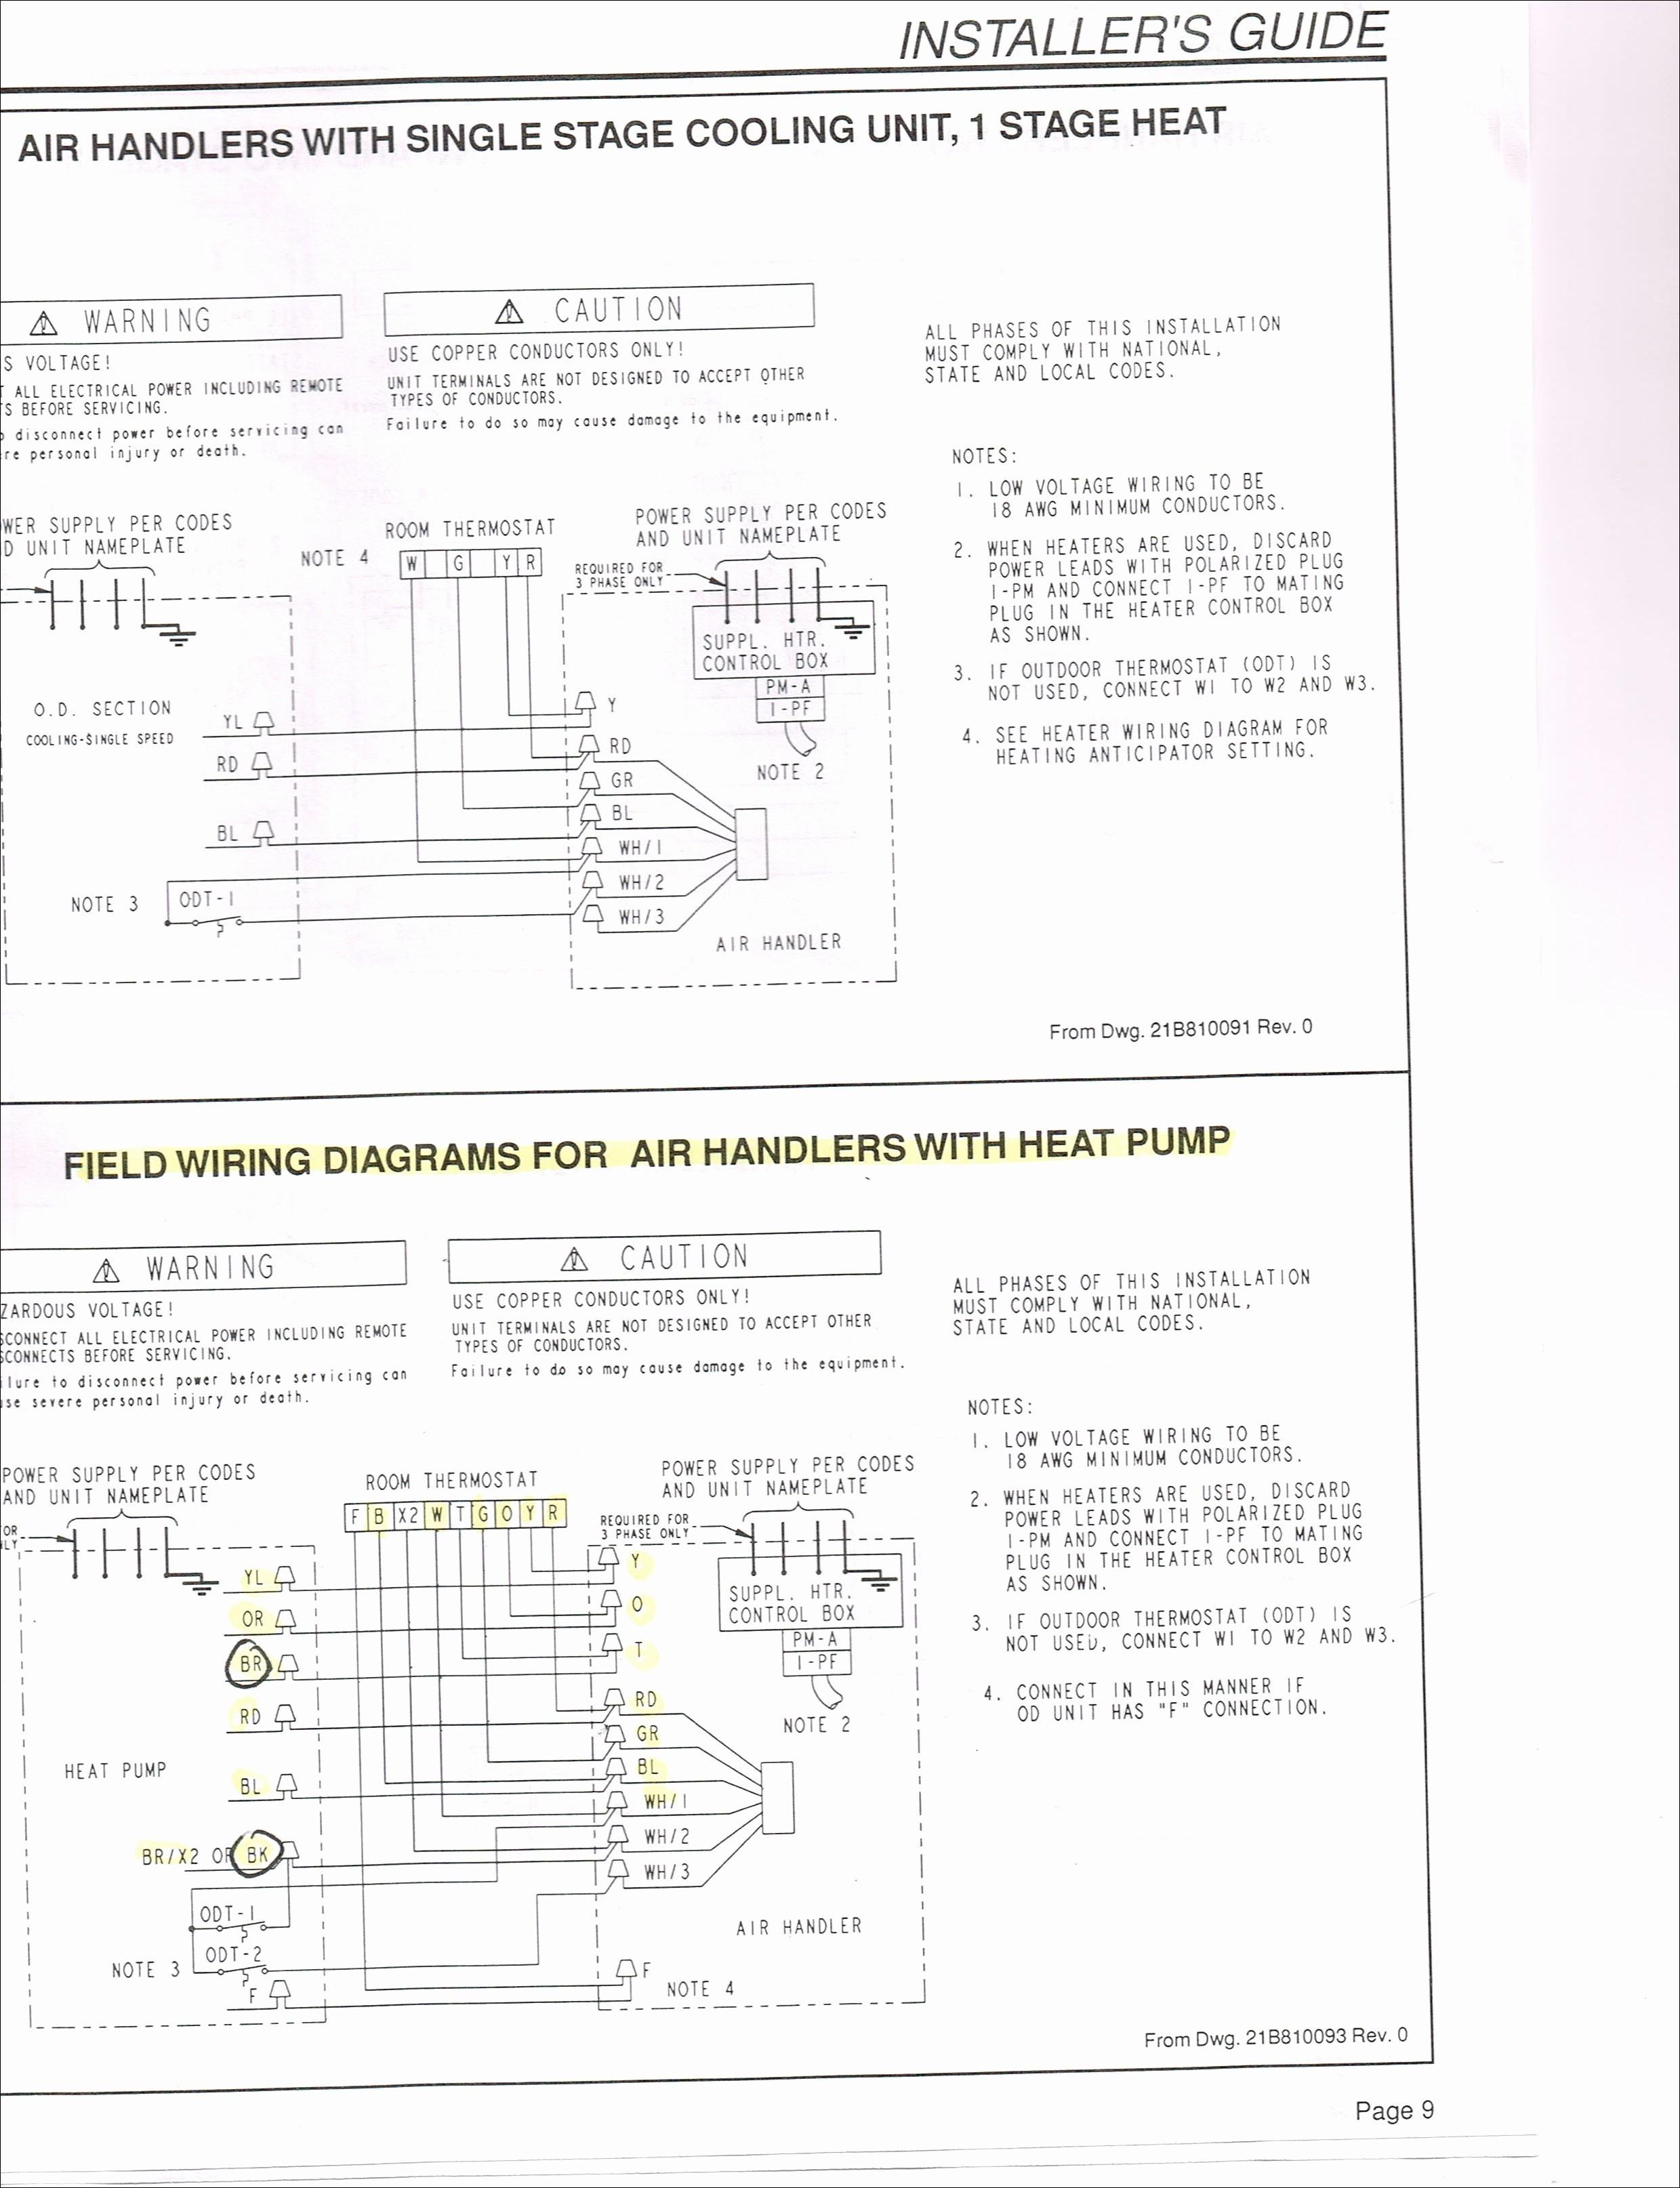 Rib Relay Wiring Diagram Awesome Rib Relay Wiring Diagram • Electrical Outlet Symbol 2018 Of Rib Relay Wiring Diagram